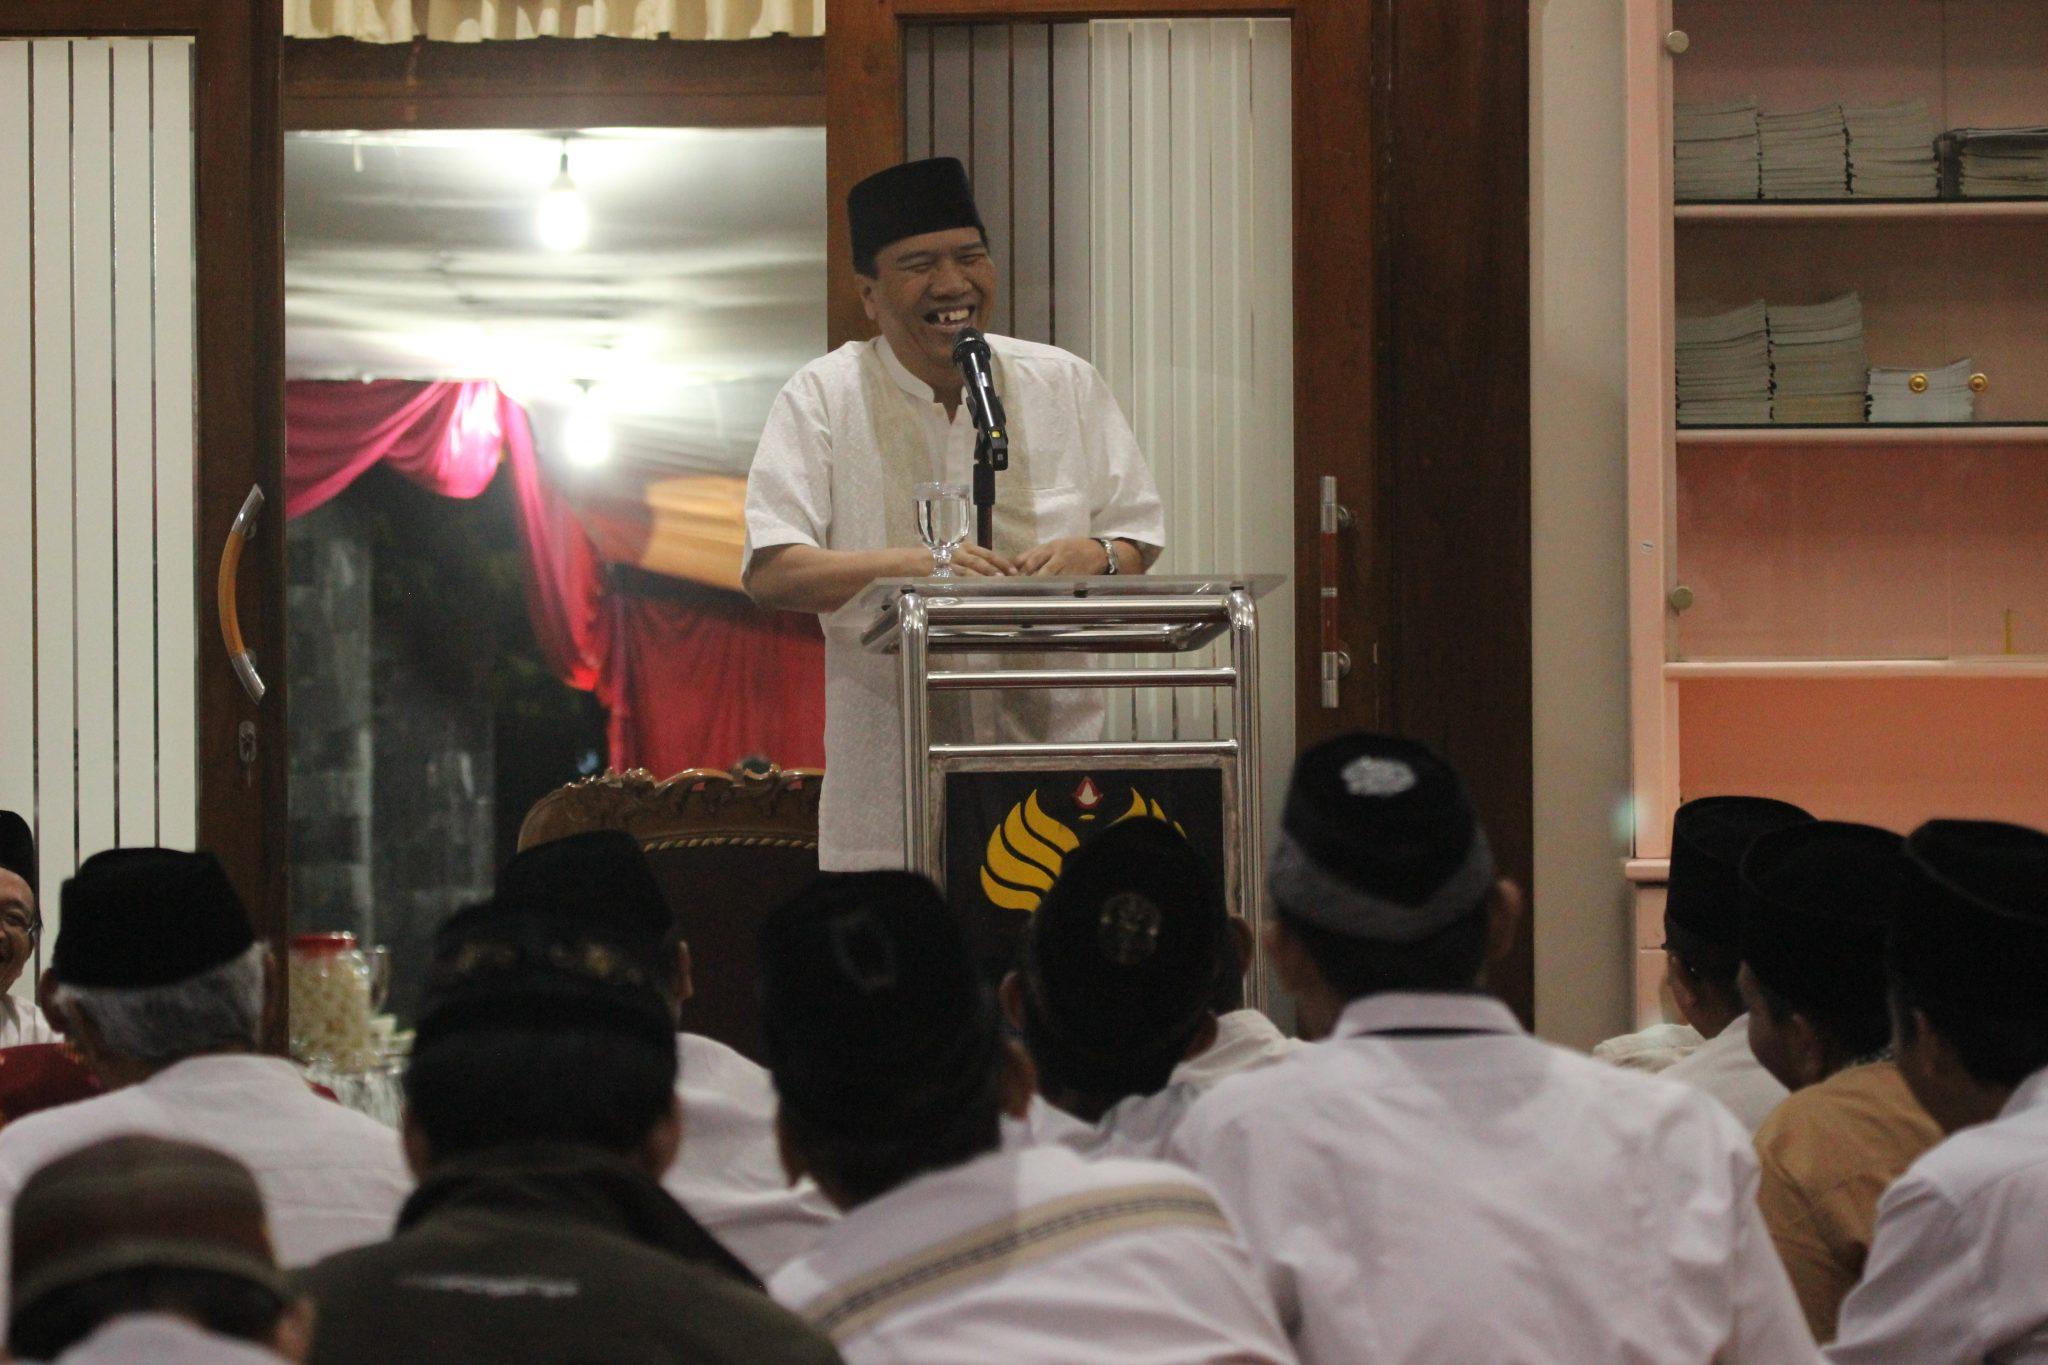 Nuzulul Quran, Prof Yos Johan  Ajak Tingkatkan  Kualitas SDM